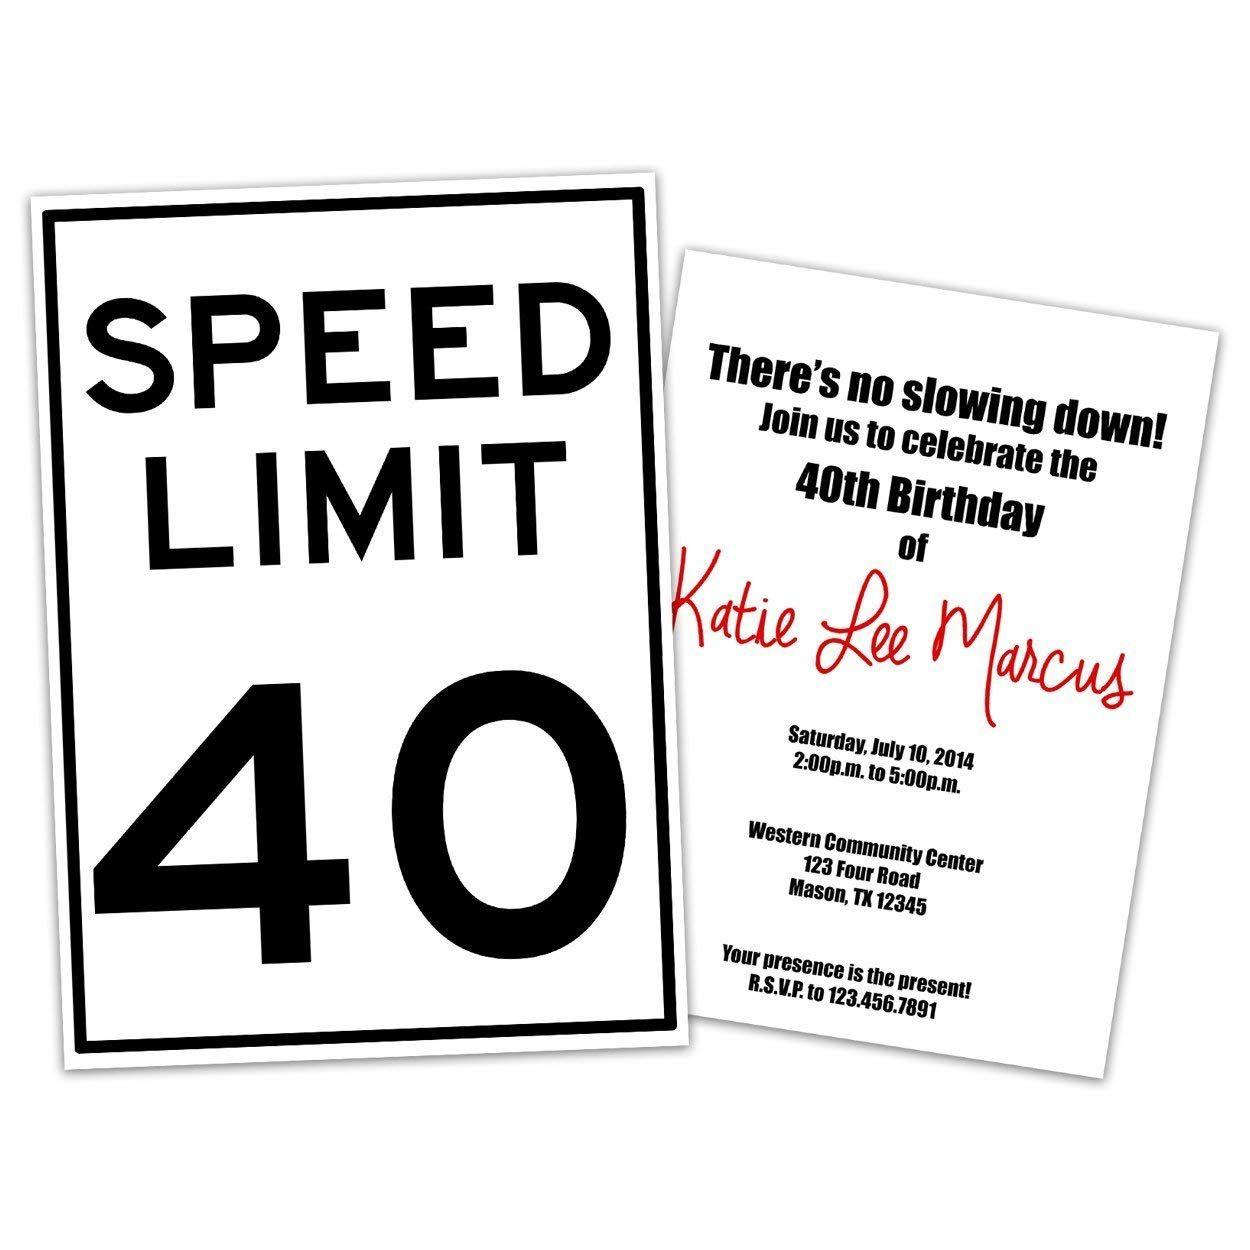 funny speed limit birthday invitations